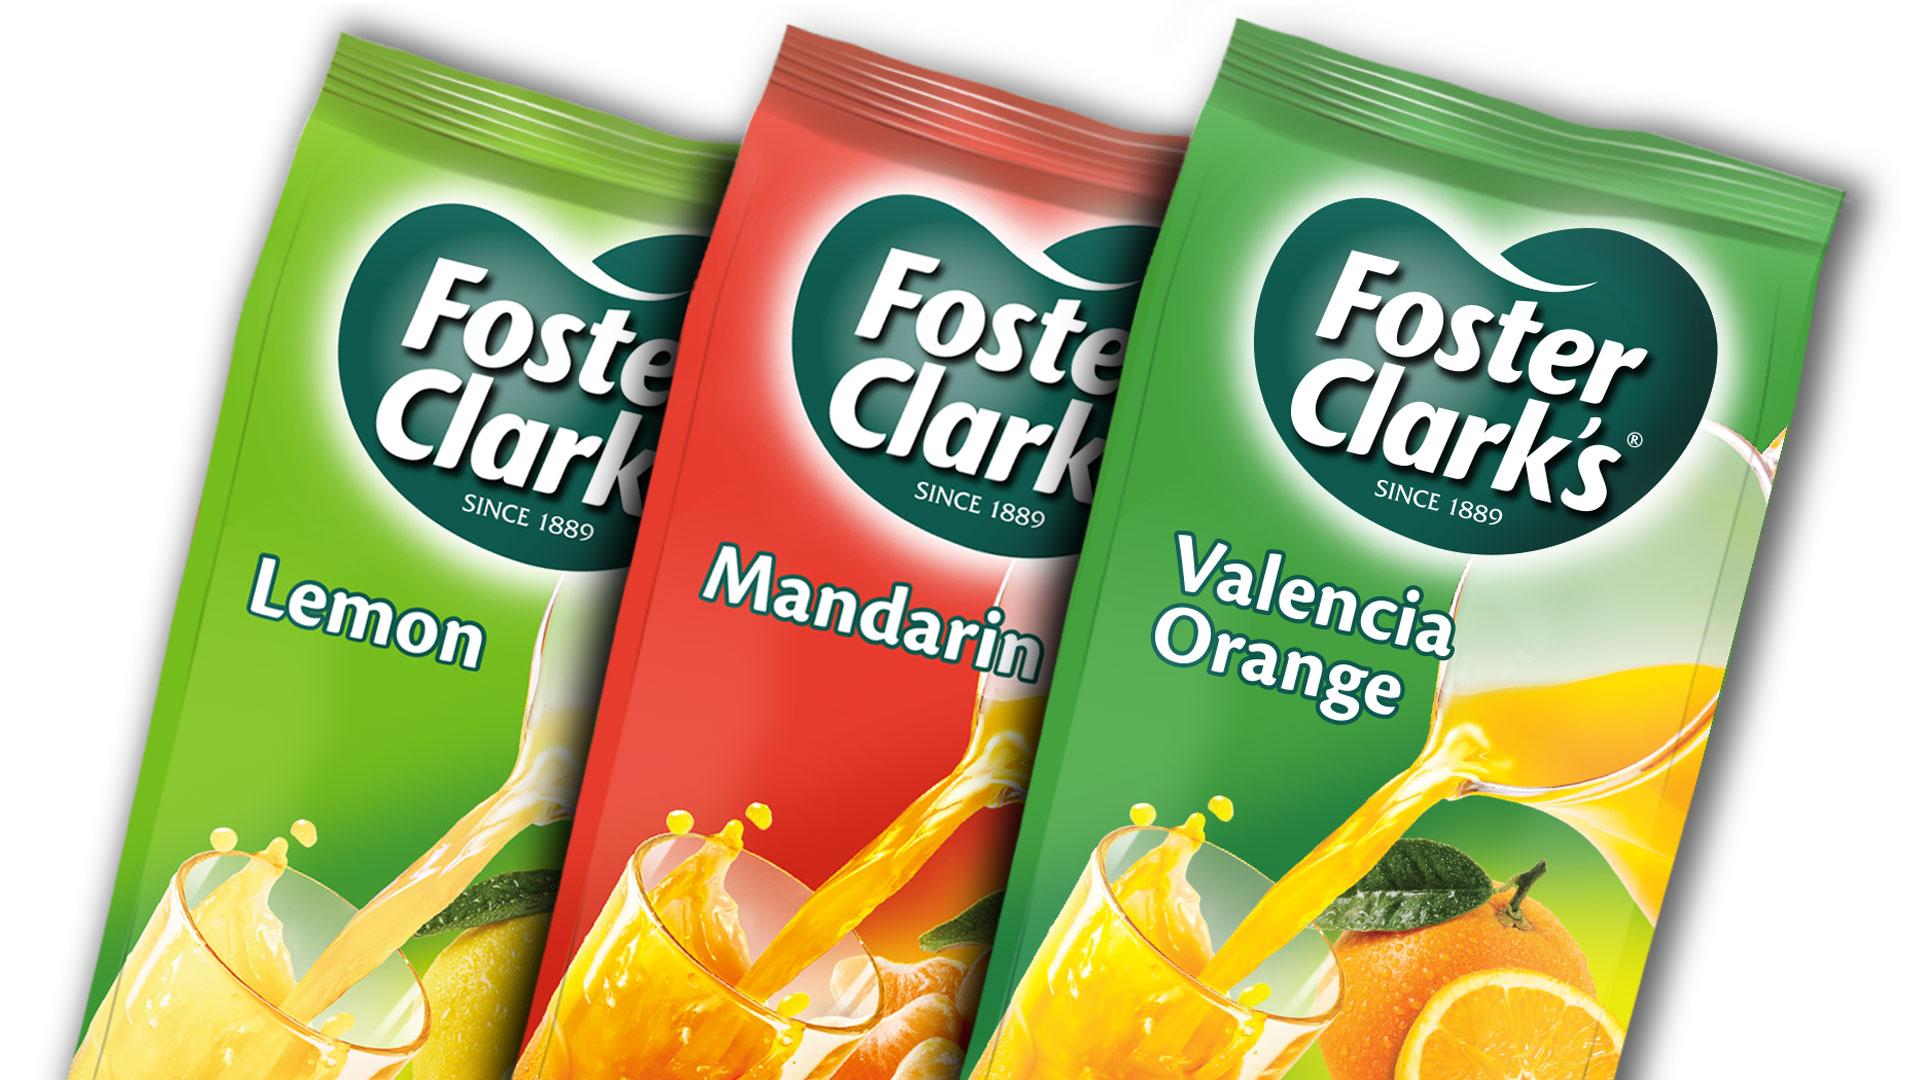 Foster Clark Drinks Design